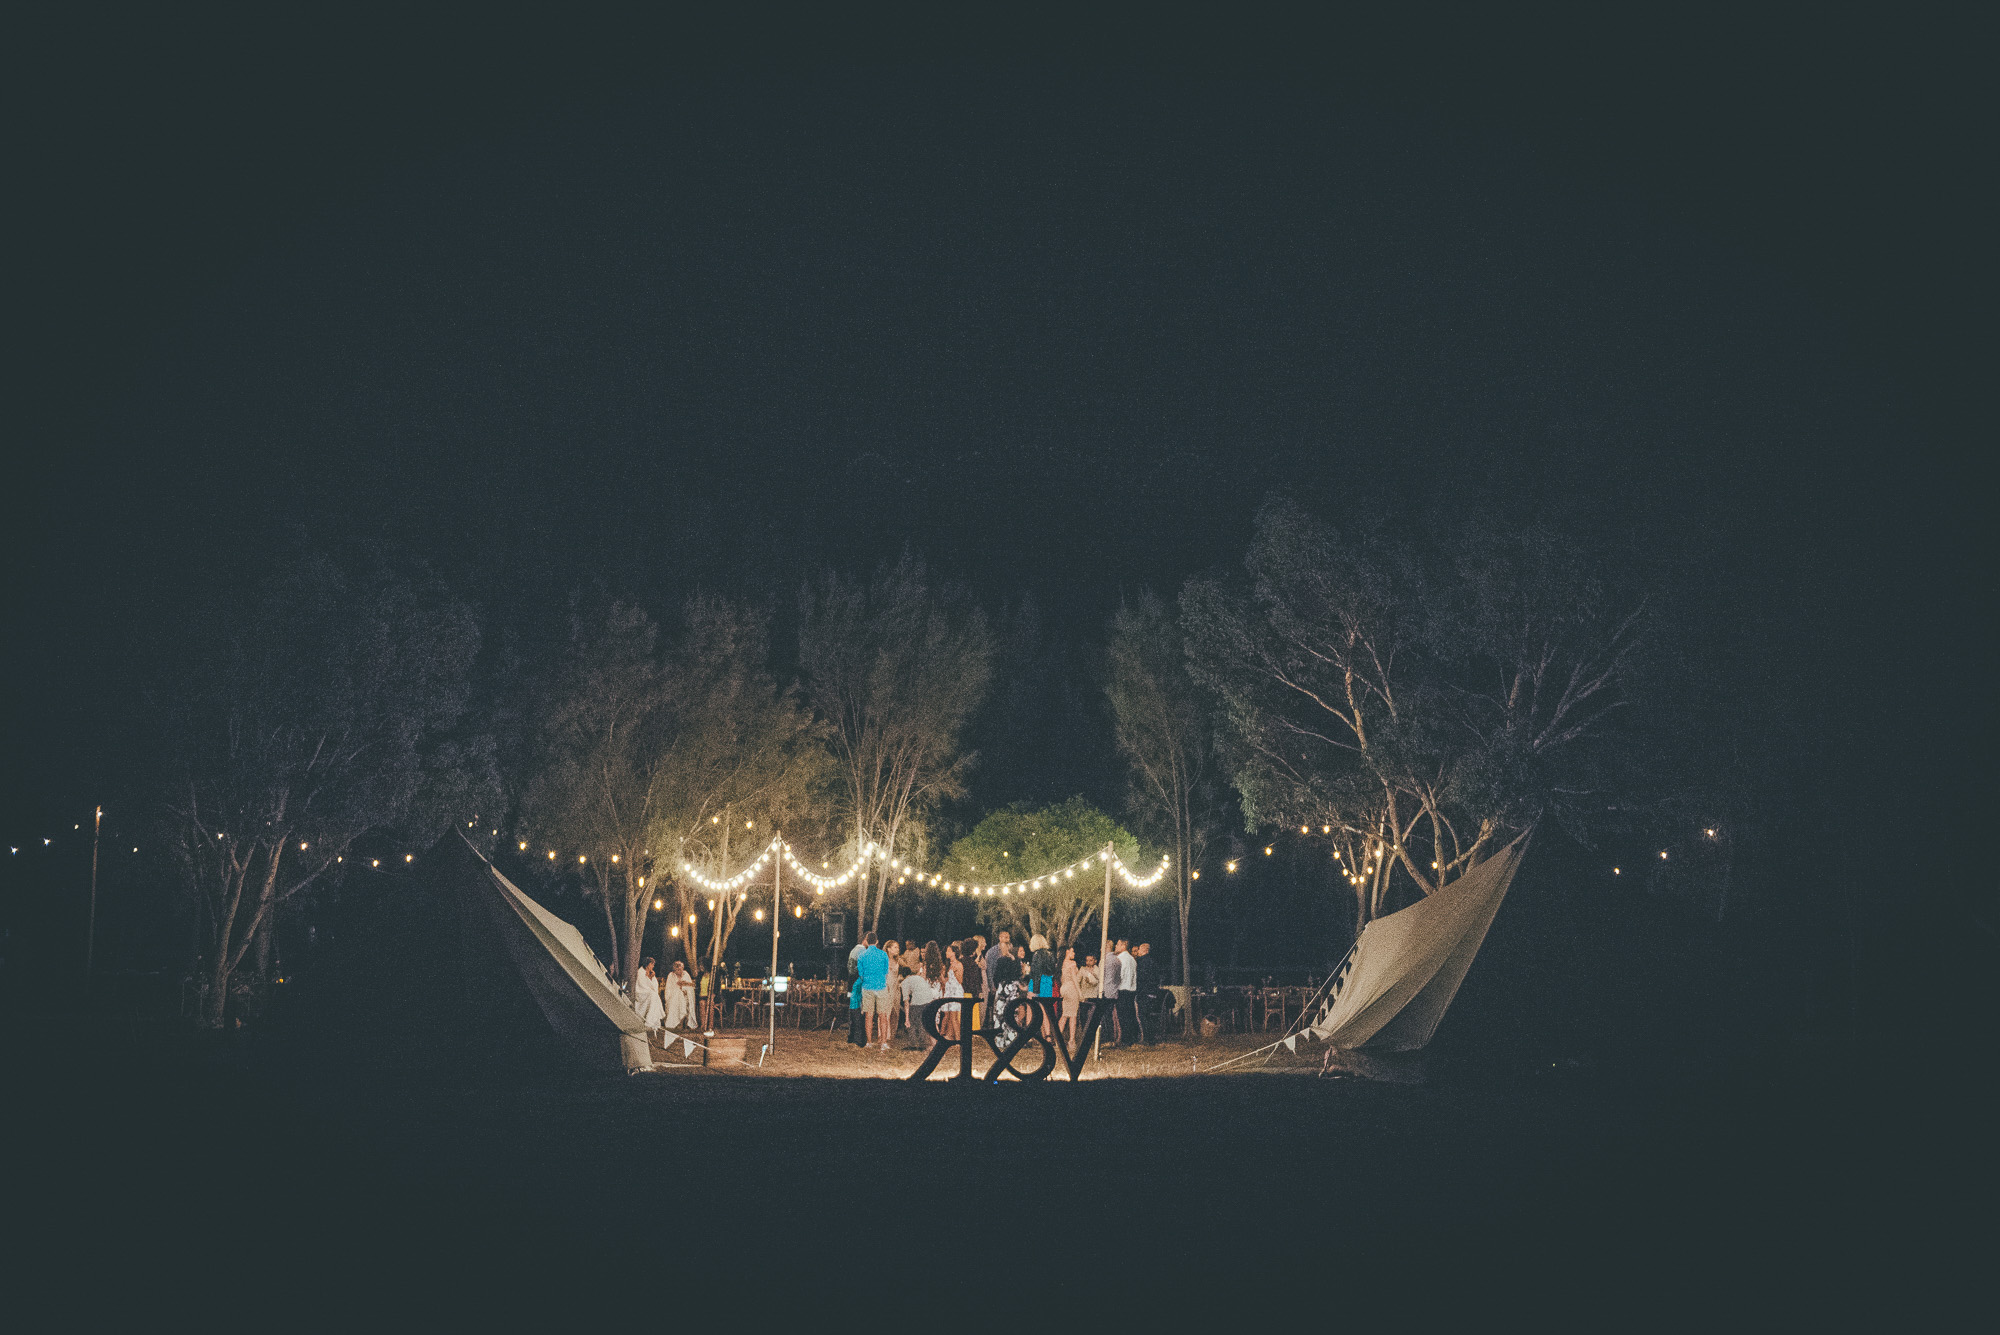 wedding-photographer-outdoor-casual-styled-los-angeles-australia-california-international-earthbound -105.jpg